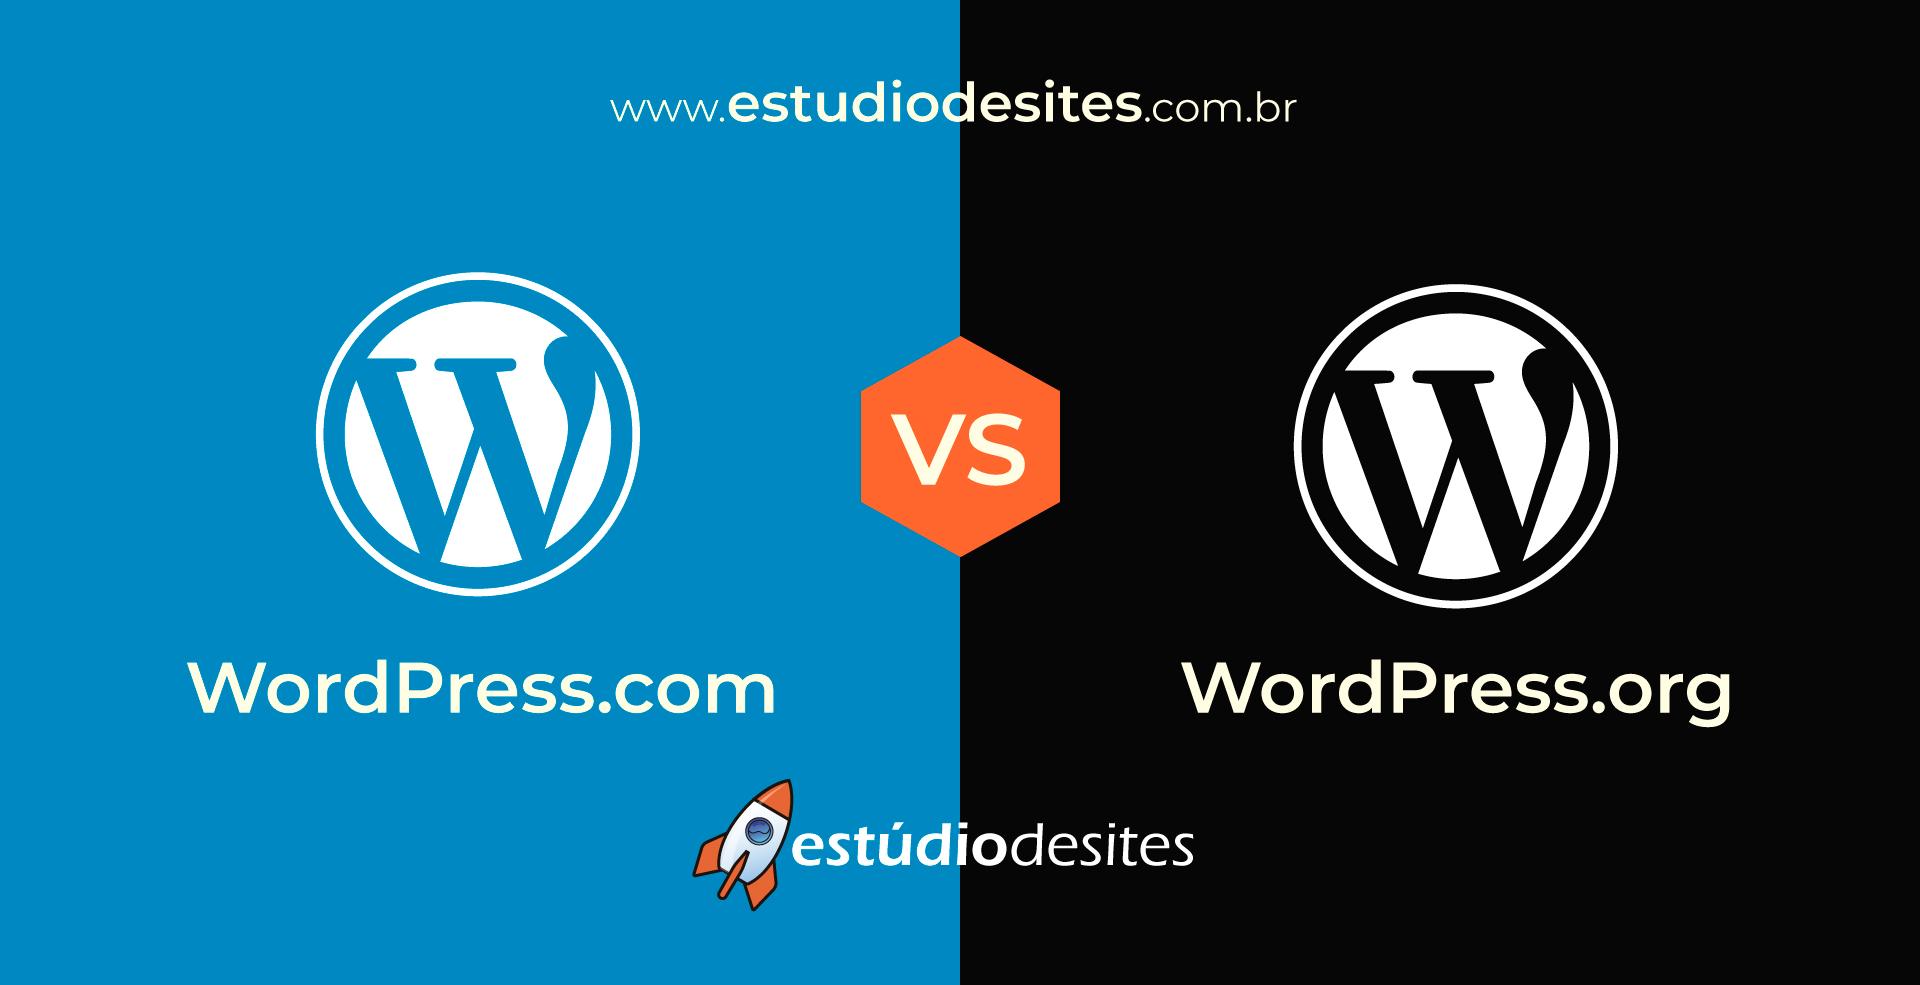 Diferença entre: WordPress.com vs WordPress.org